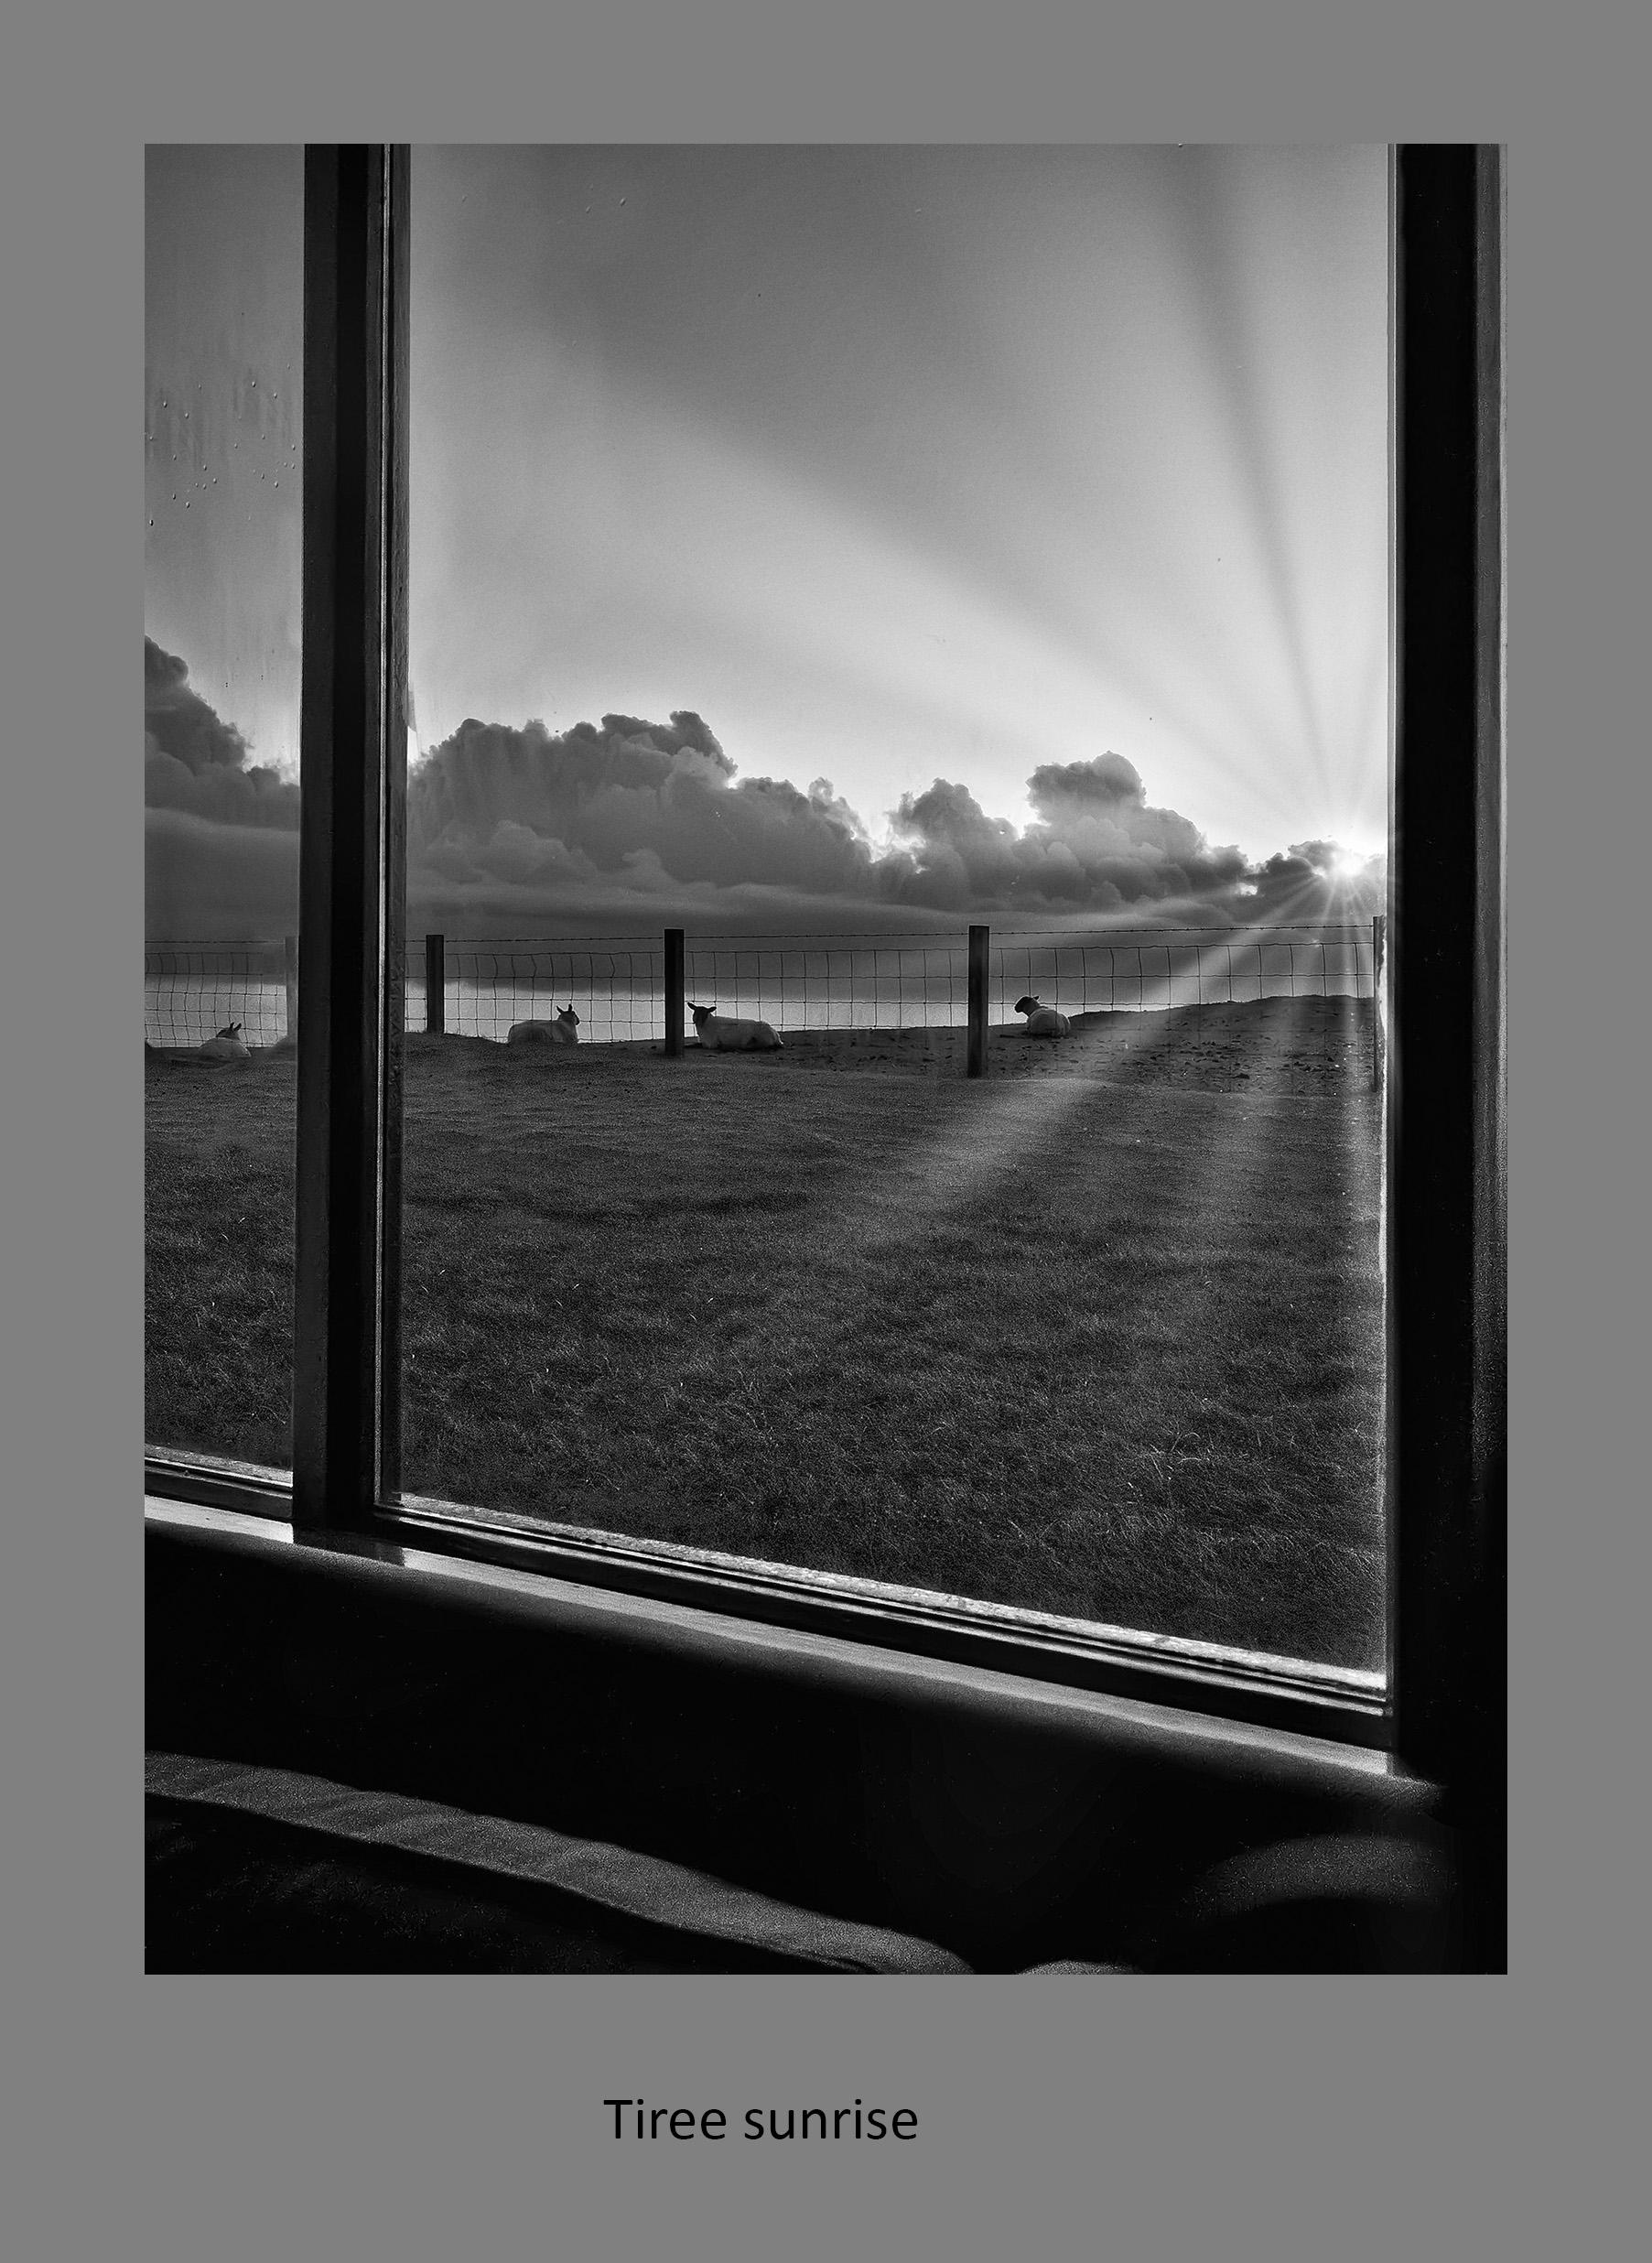 Tiree Sunrise